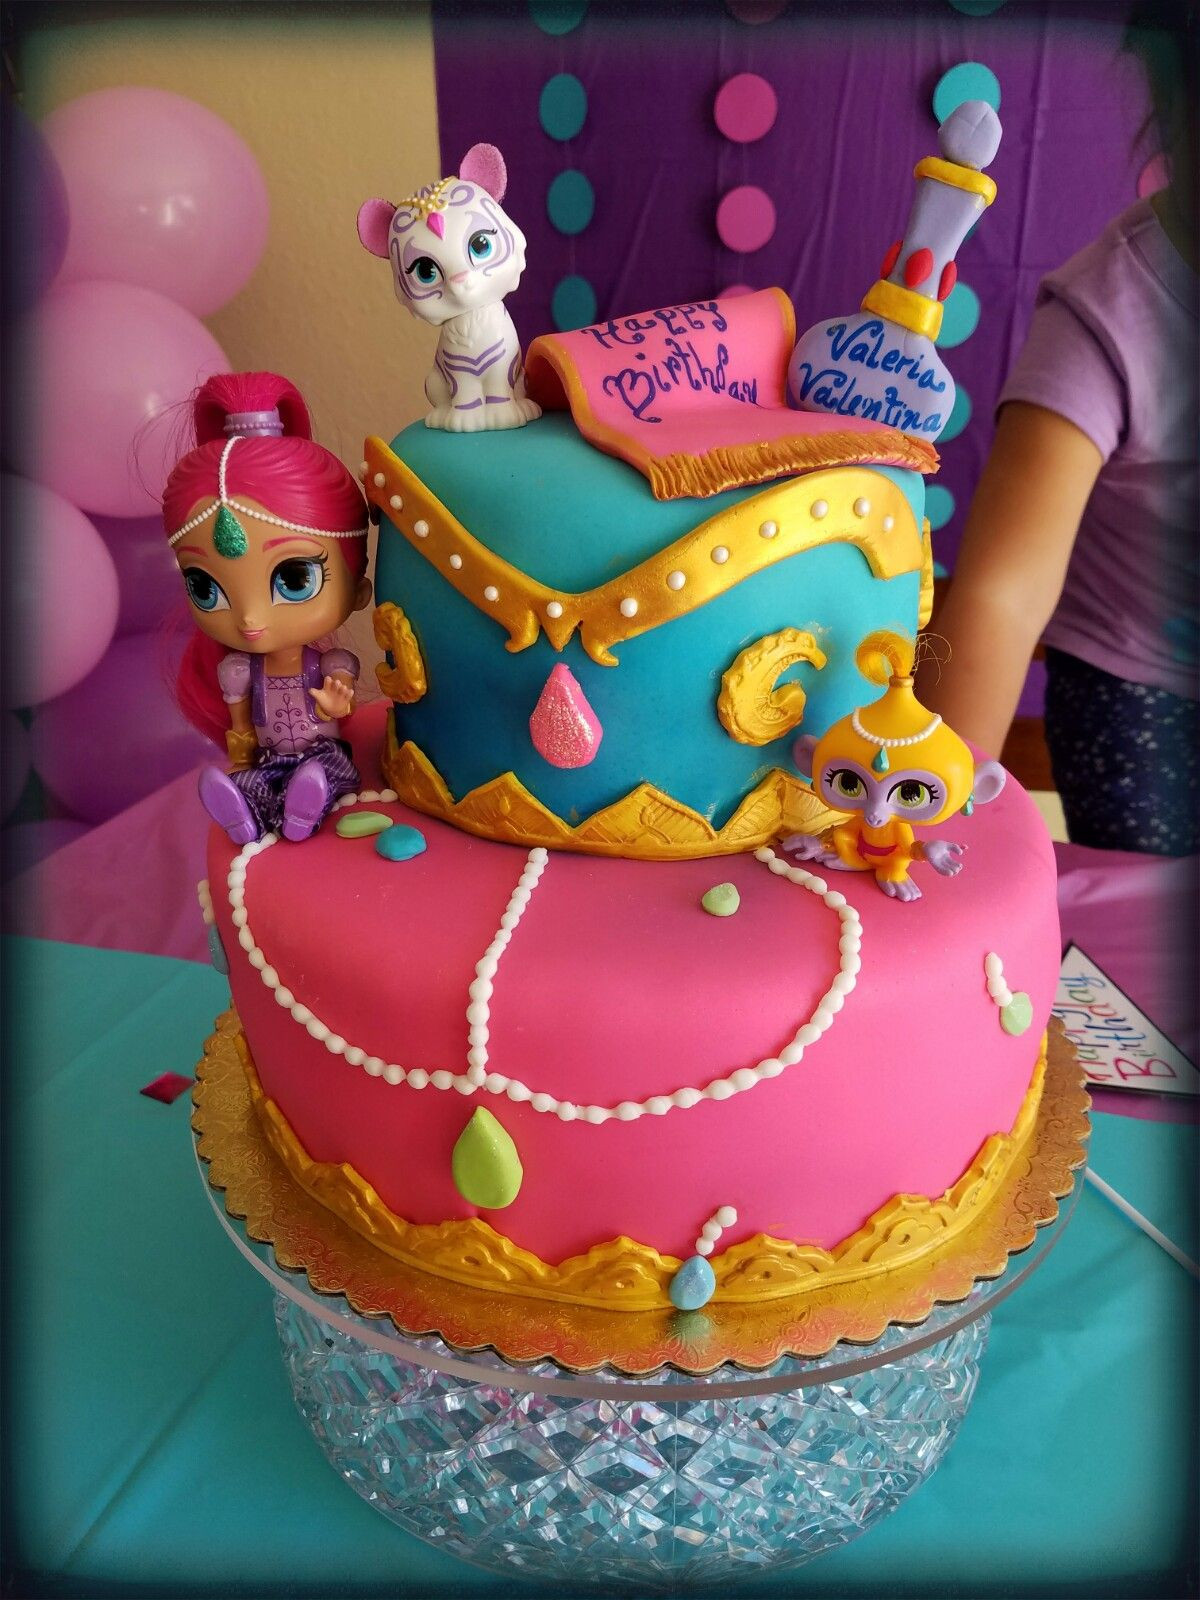 Shimmer And Shine Birthday Cake  Shimmer and shine cake Jayxor Cakes Pinterest